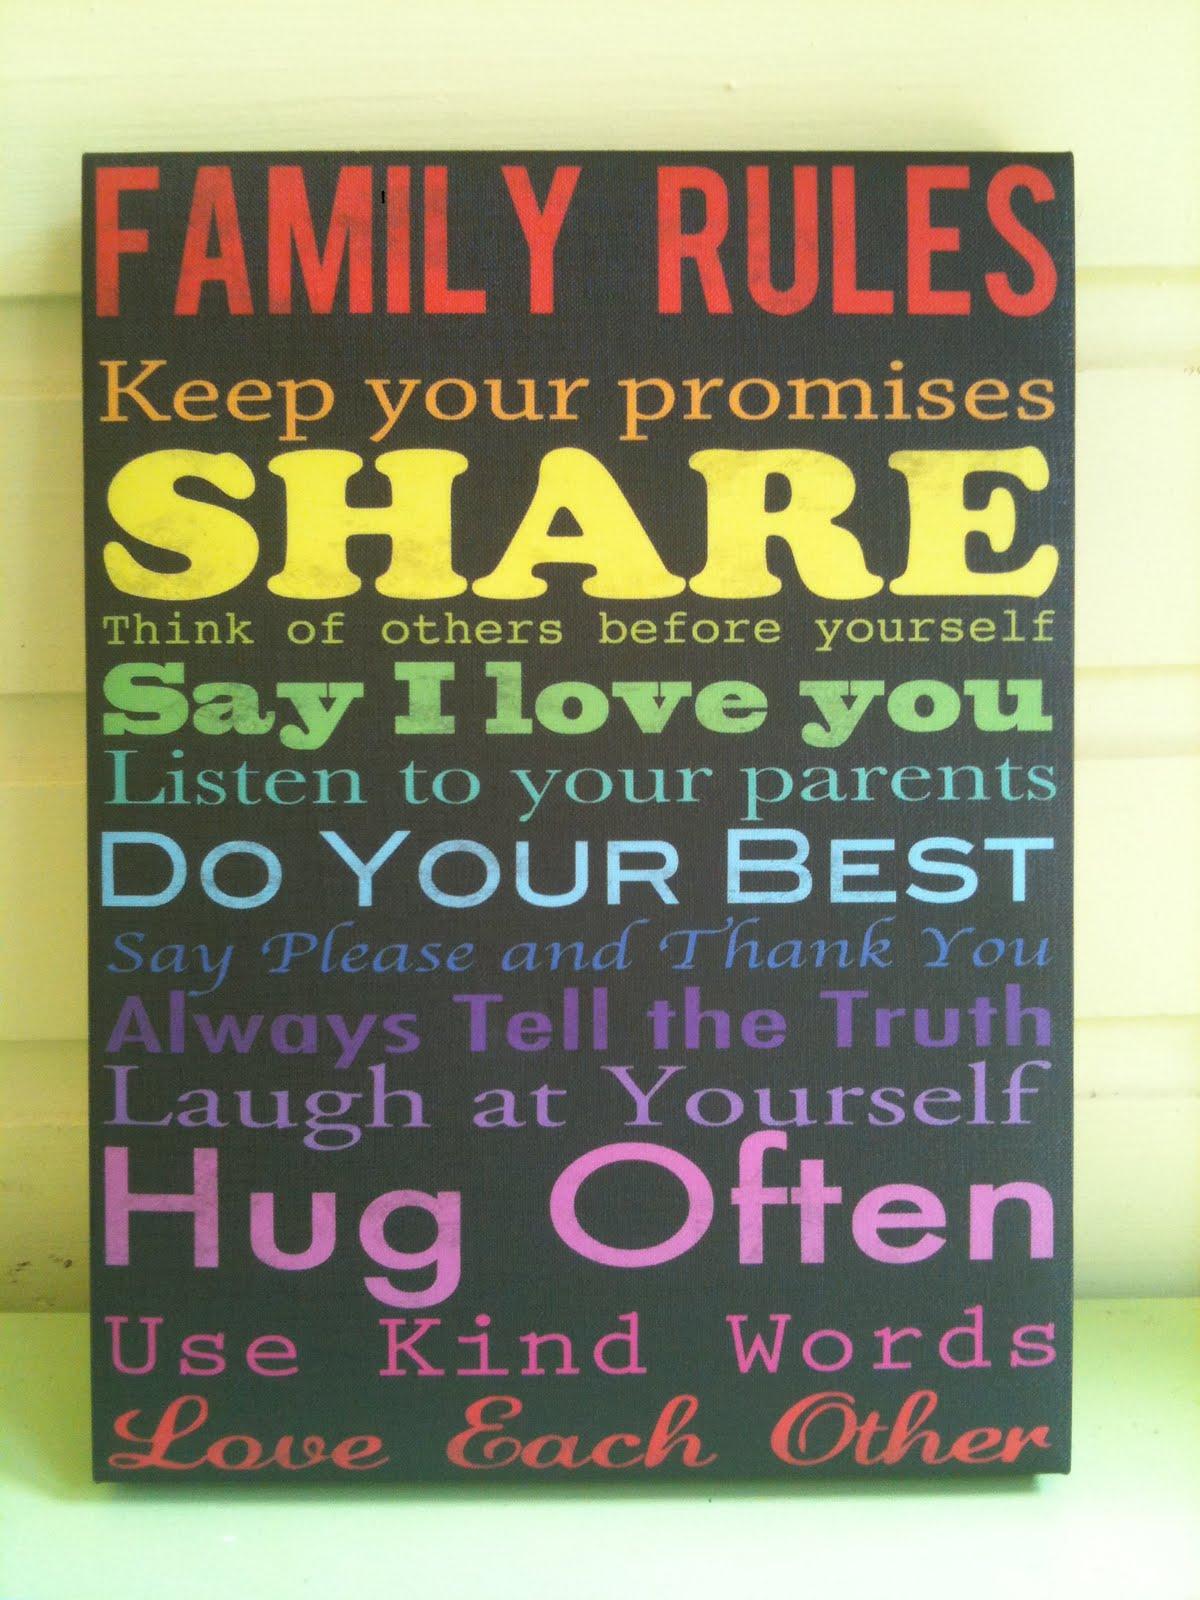 821 Johnson Avenue Family Rules